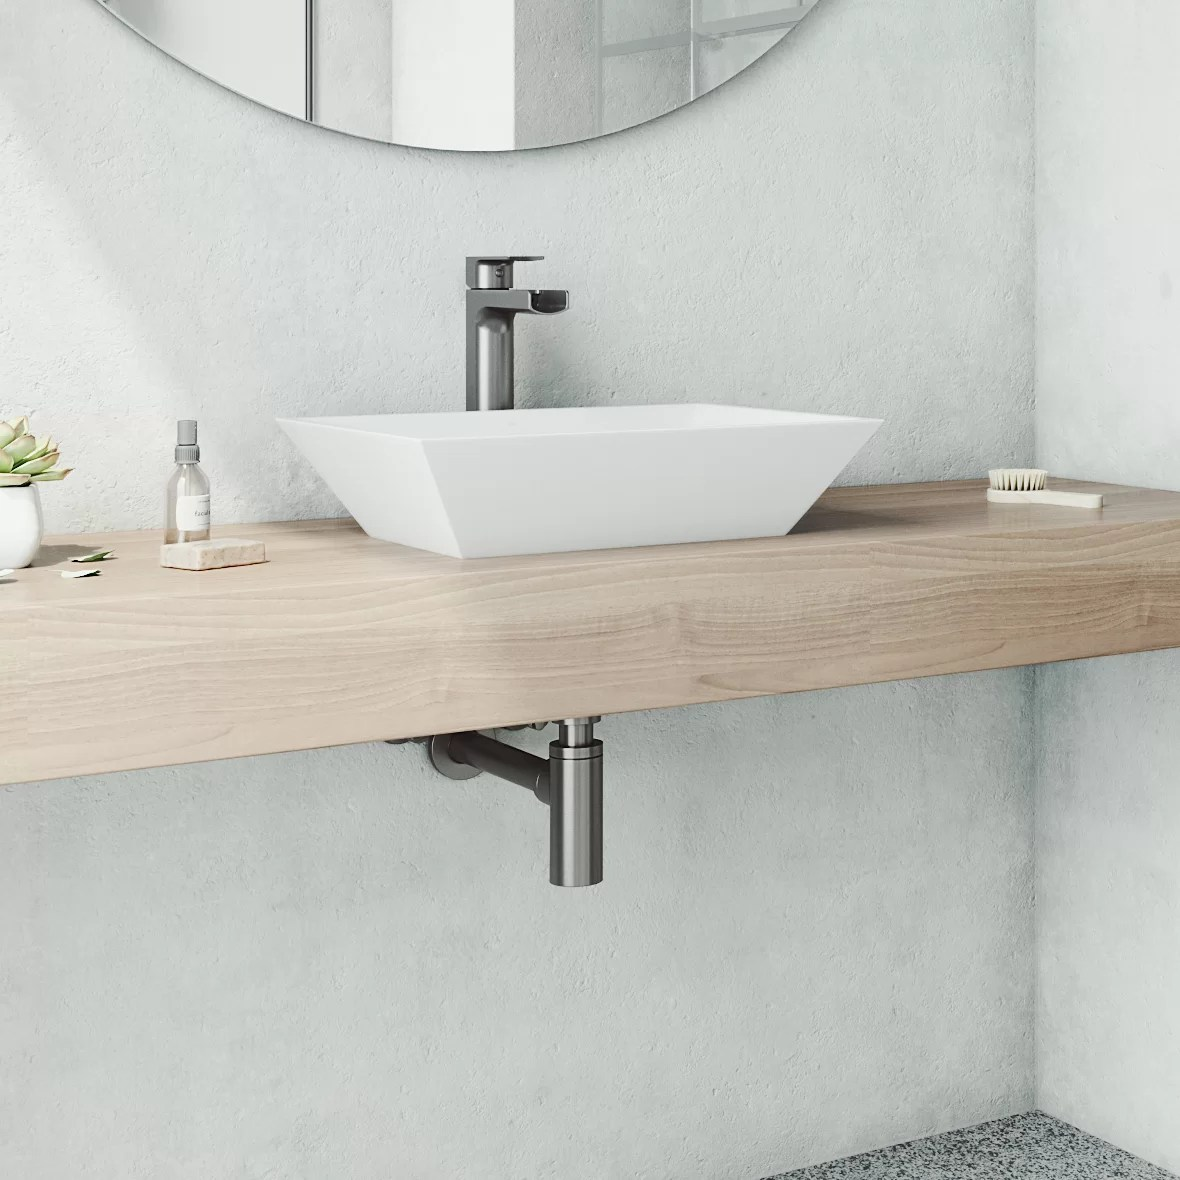 vinca white stone handmade rectangular vessel bathroom sink with faucet